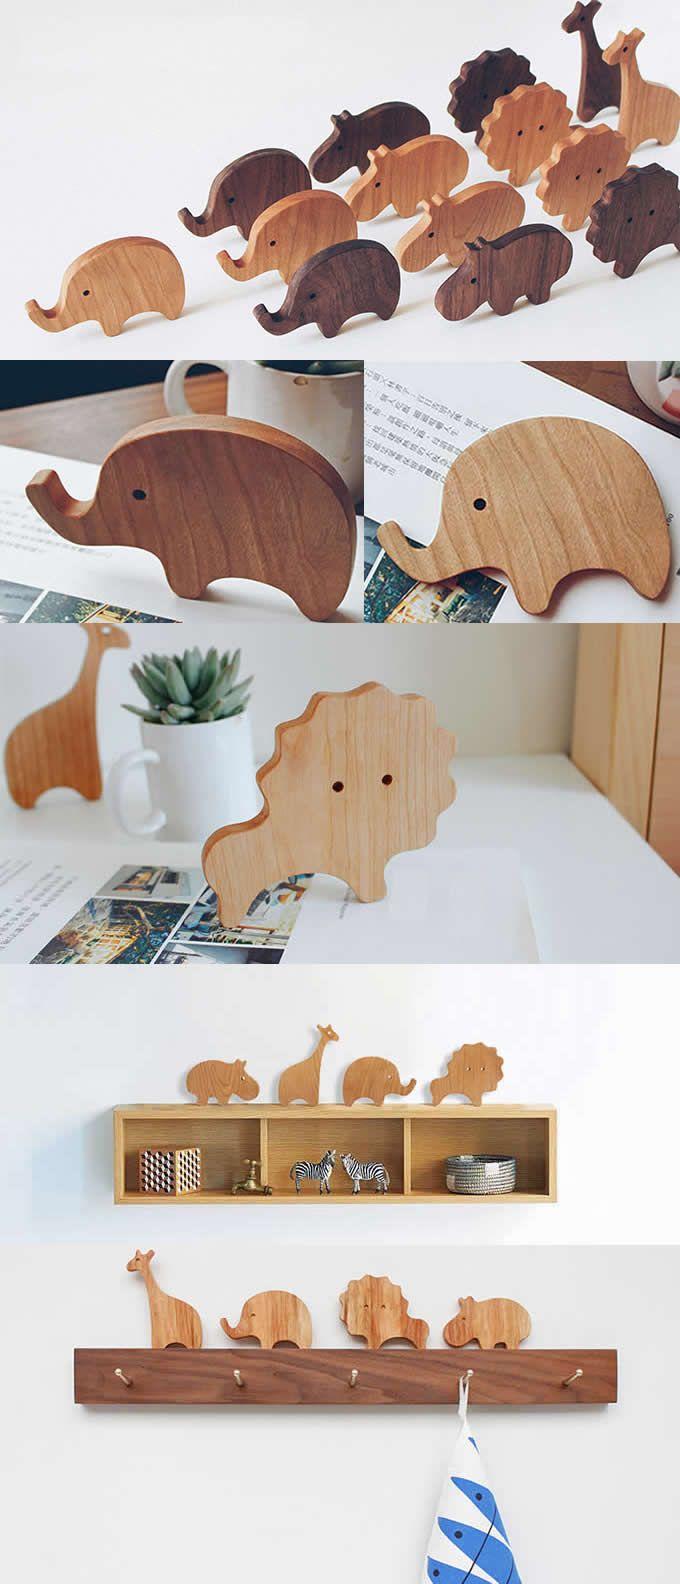 Simple original modern wooden animal desktop ornaments handmade wood Elephant/Giraffe/Hippo/lion/ figurine new creative home decorations